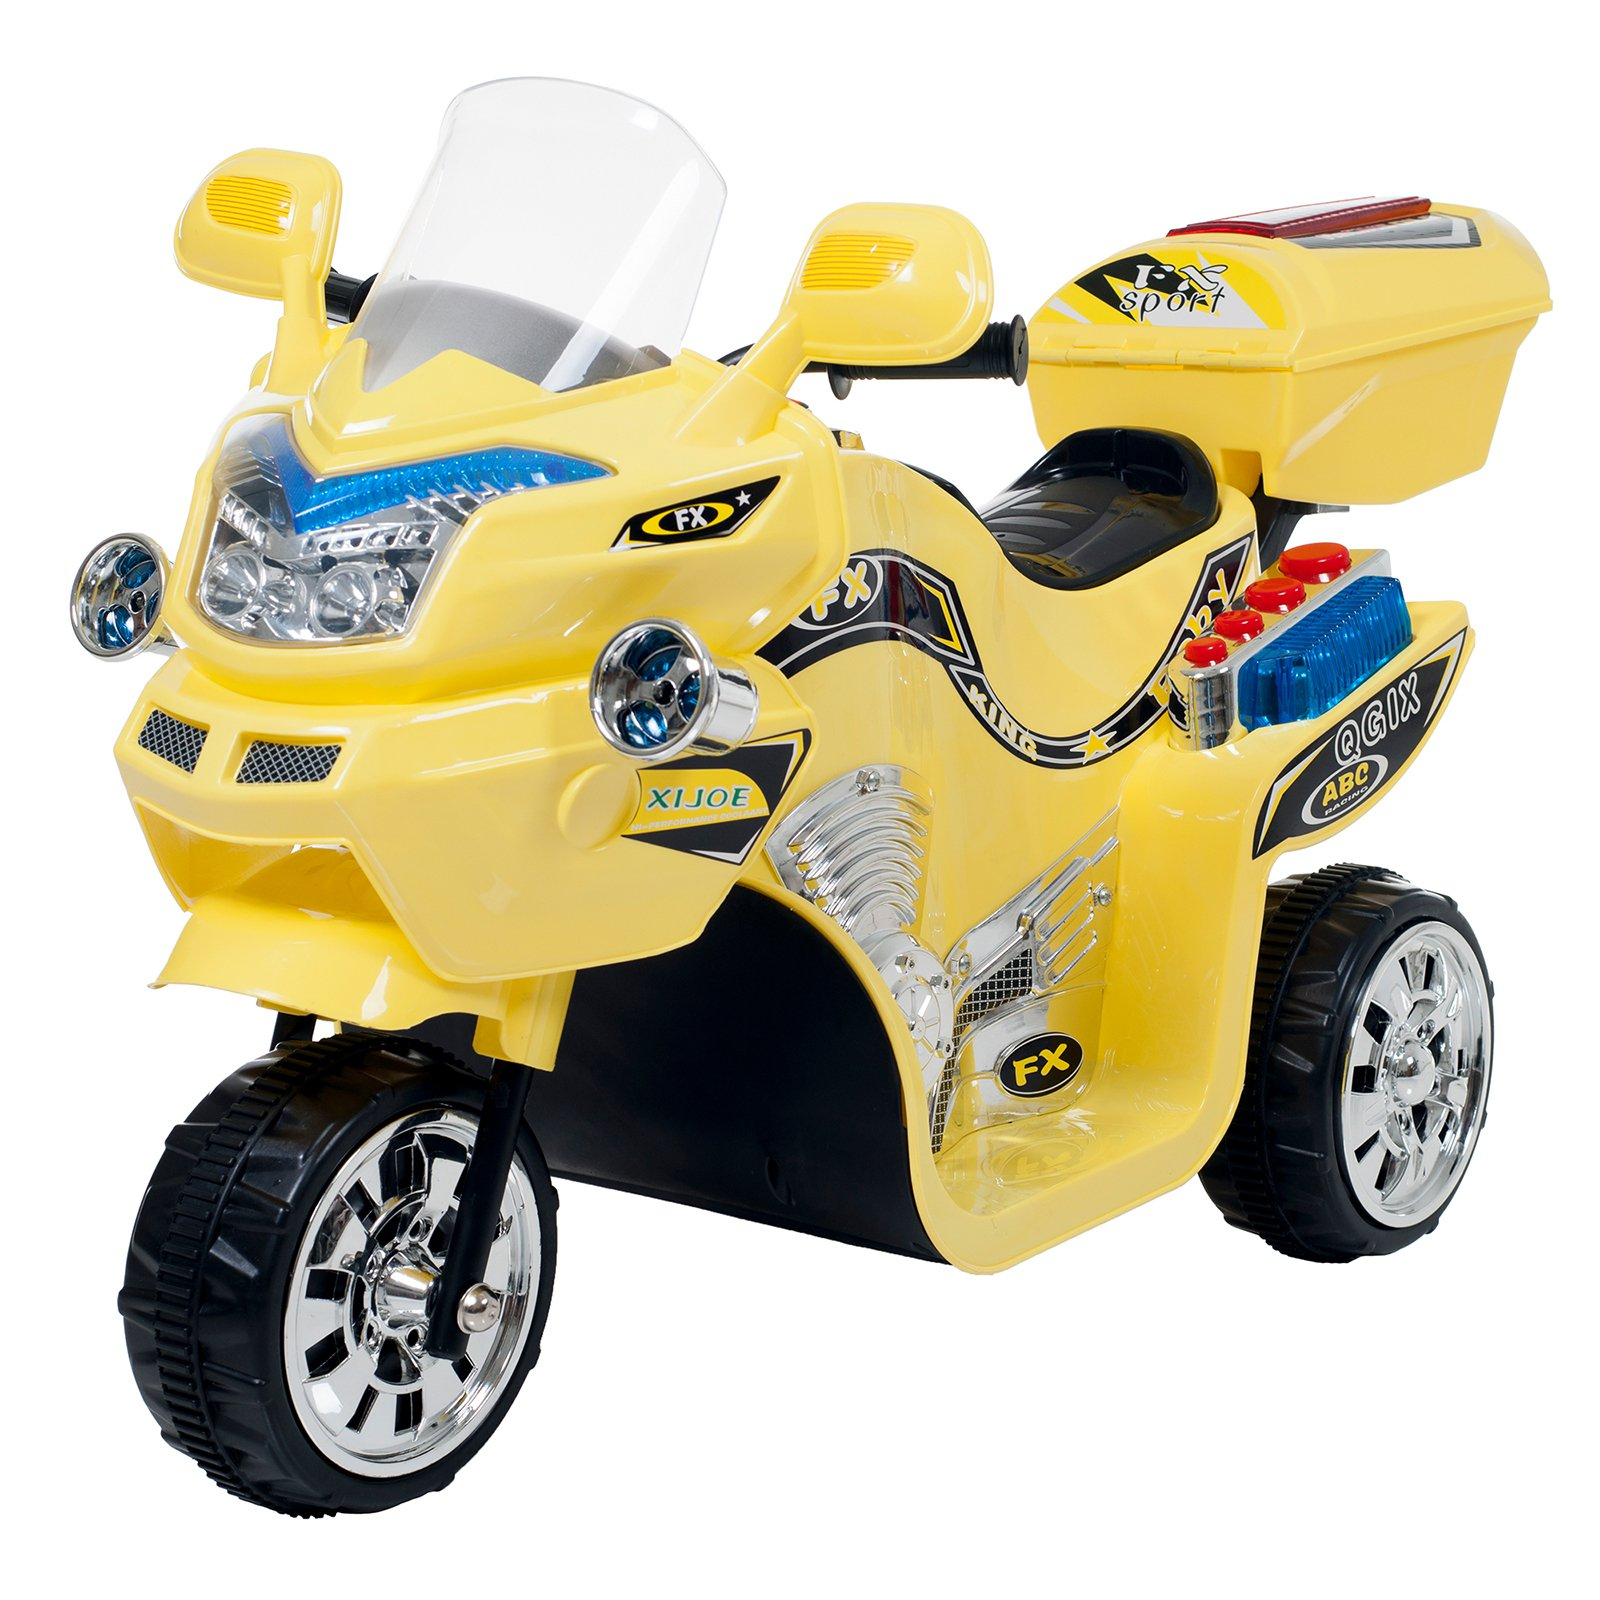 Lil Rider 3 Wheel FX Sport Bike Battery Powered Riding Toy